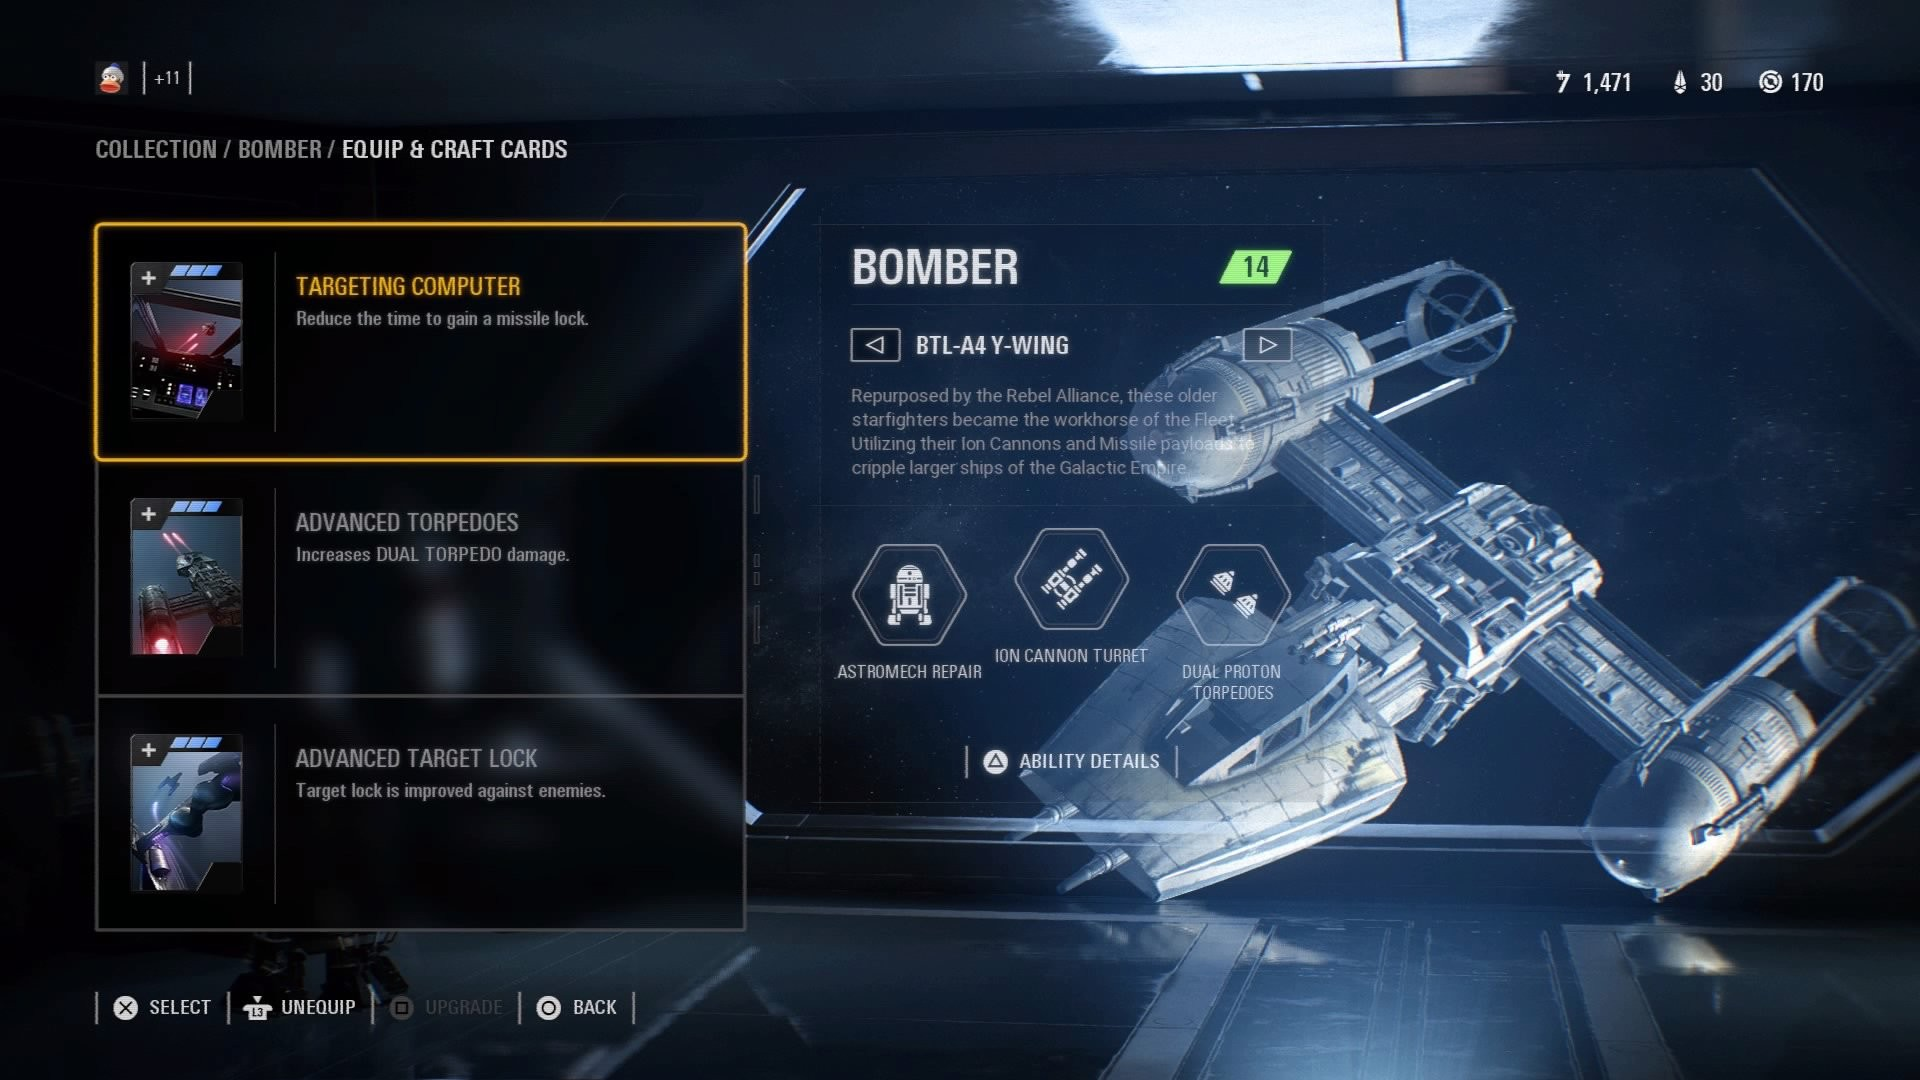 The Bomber Trophy Star Wars Battlefront Ii Psnprofiles Com